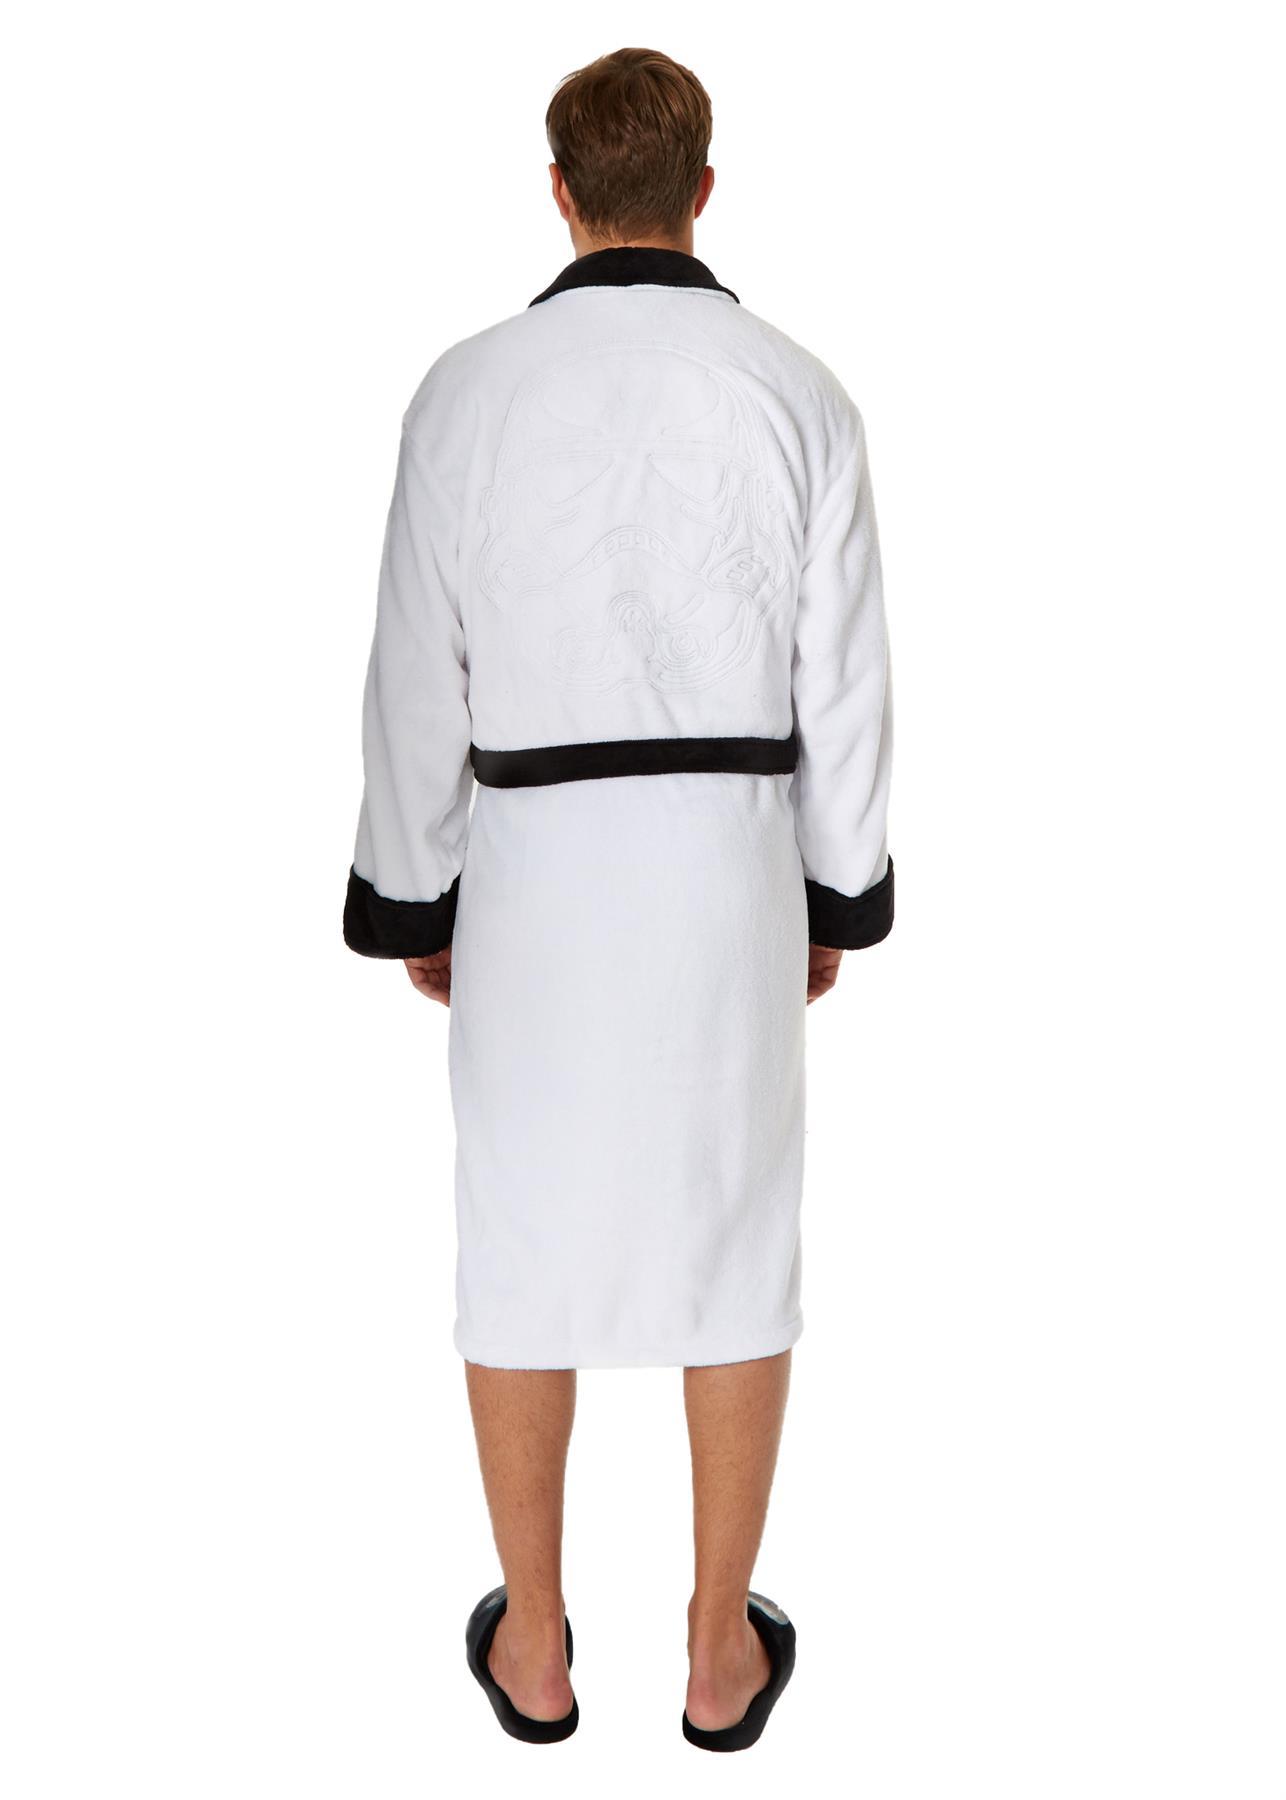 Stars Wars Baby Yoda Chewbacca Jedi Trooper Vadar Kylo Ren Robe Dressing Gown Ebay